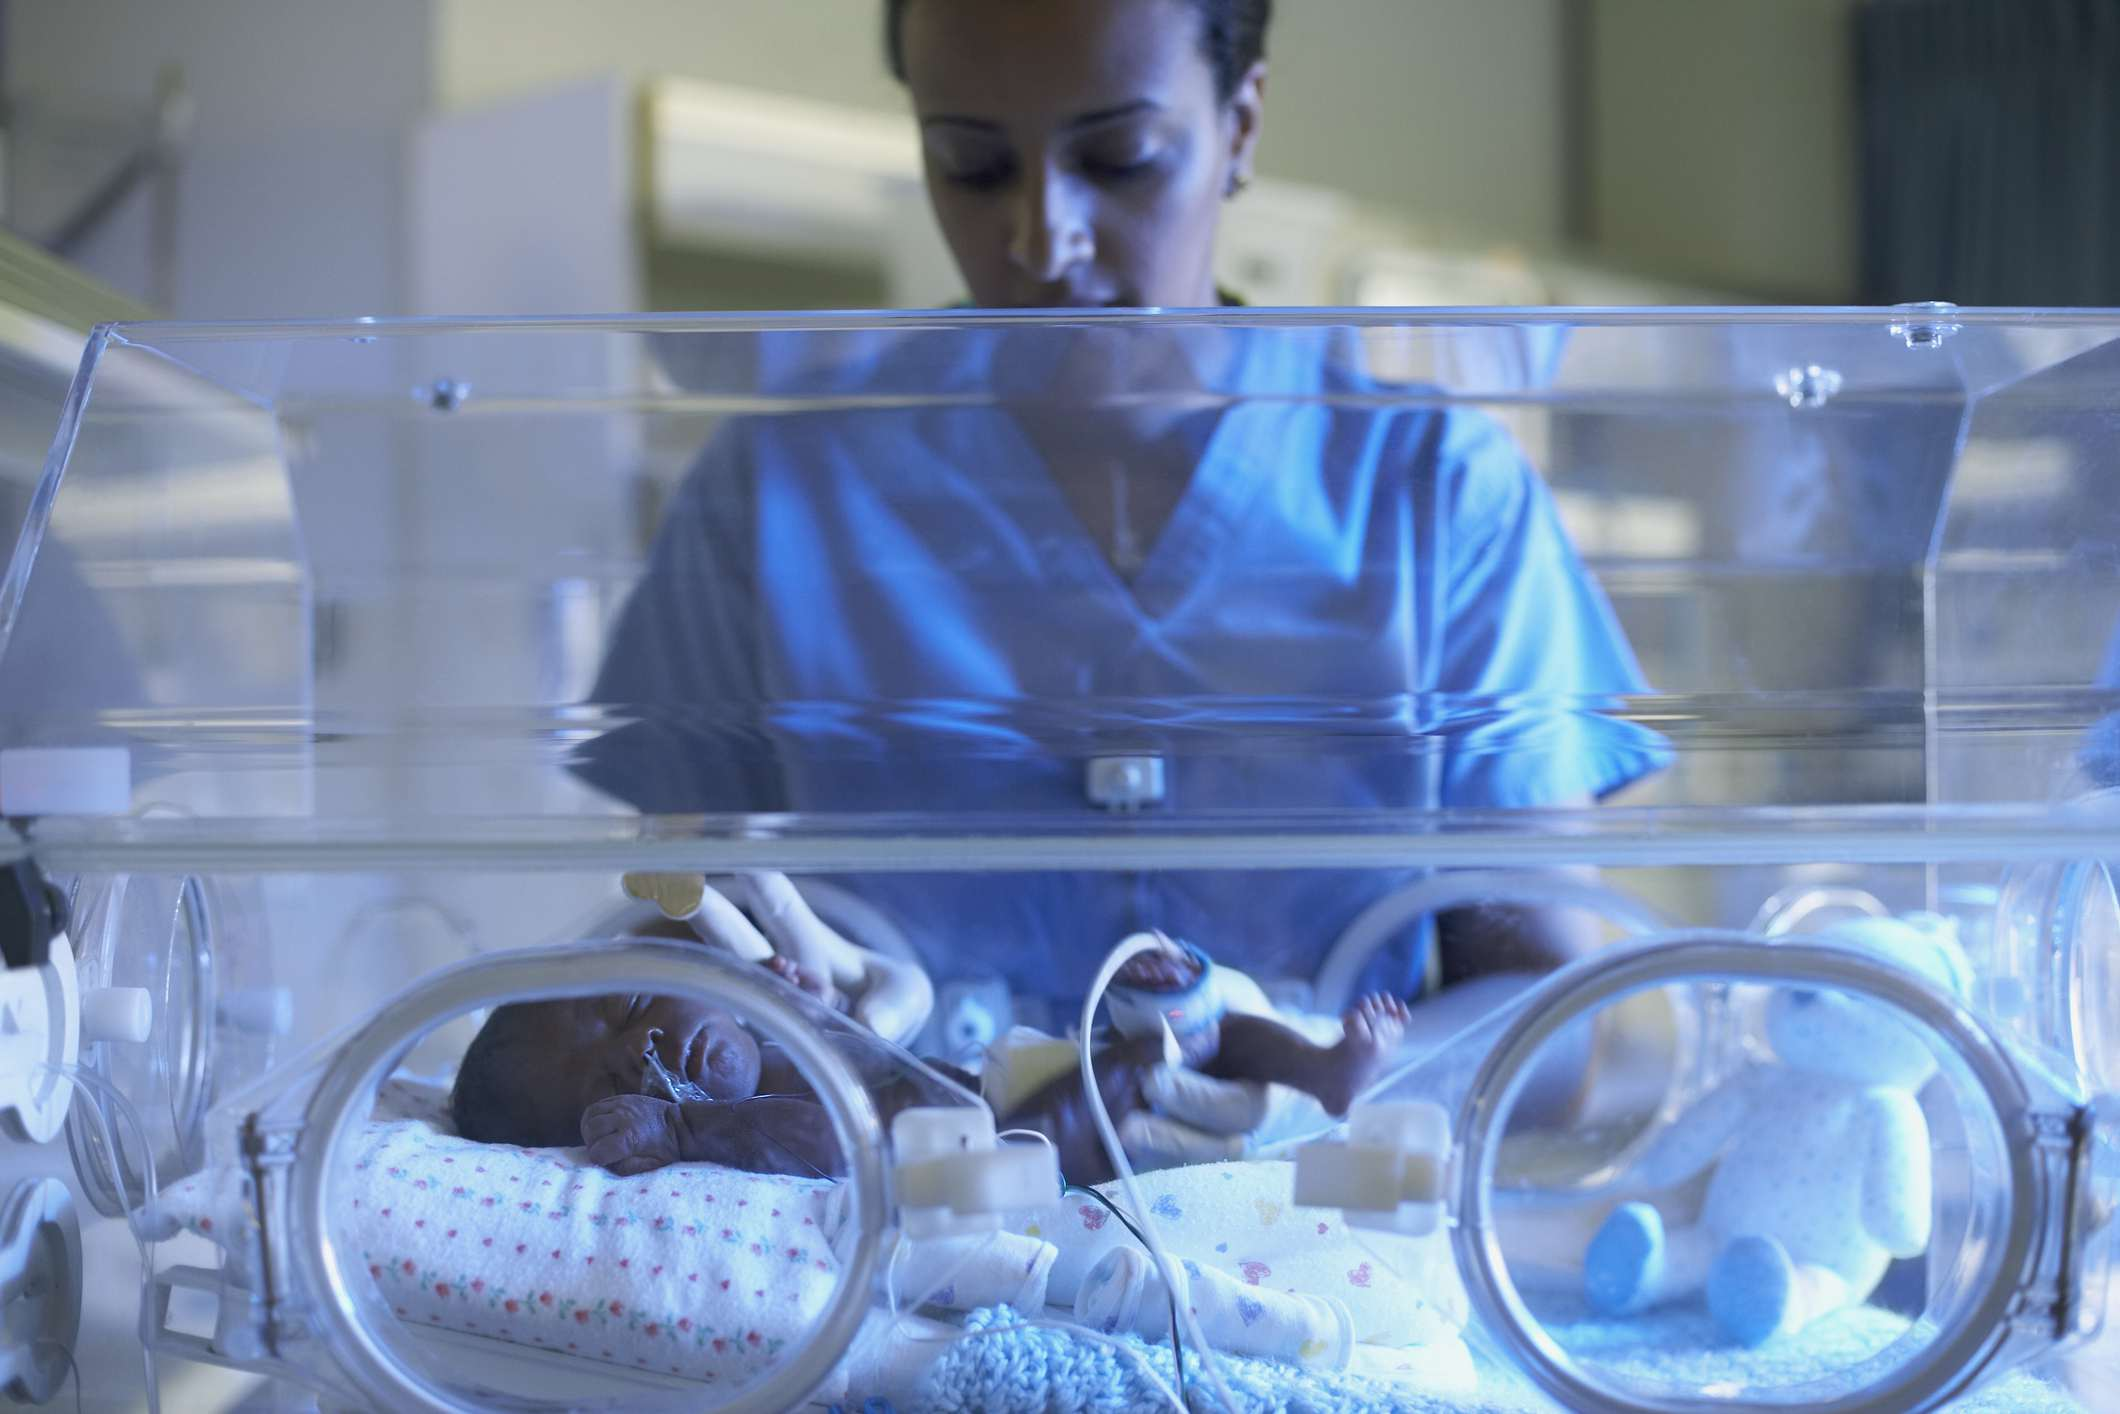 NICU Krankenschwester